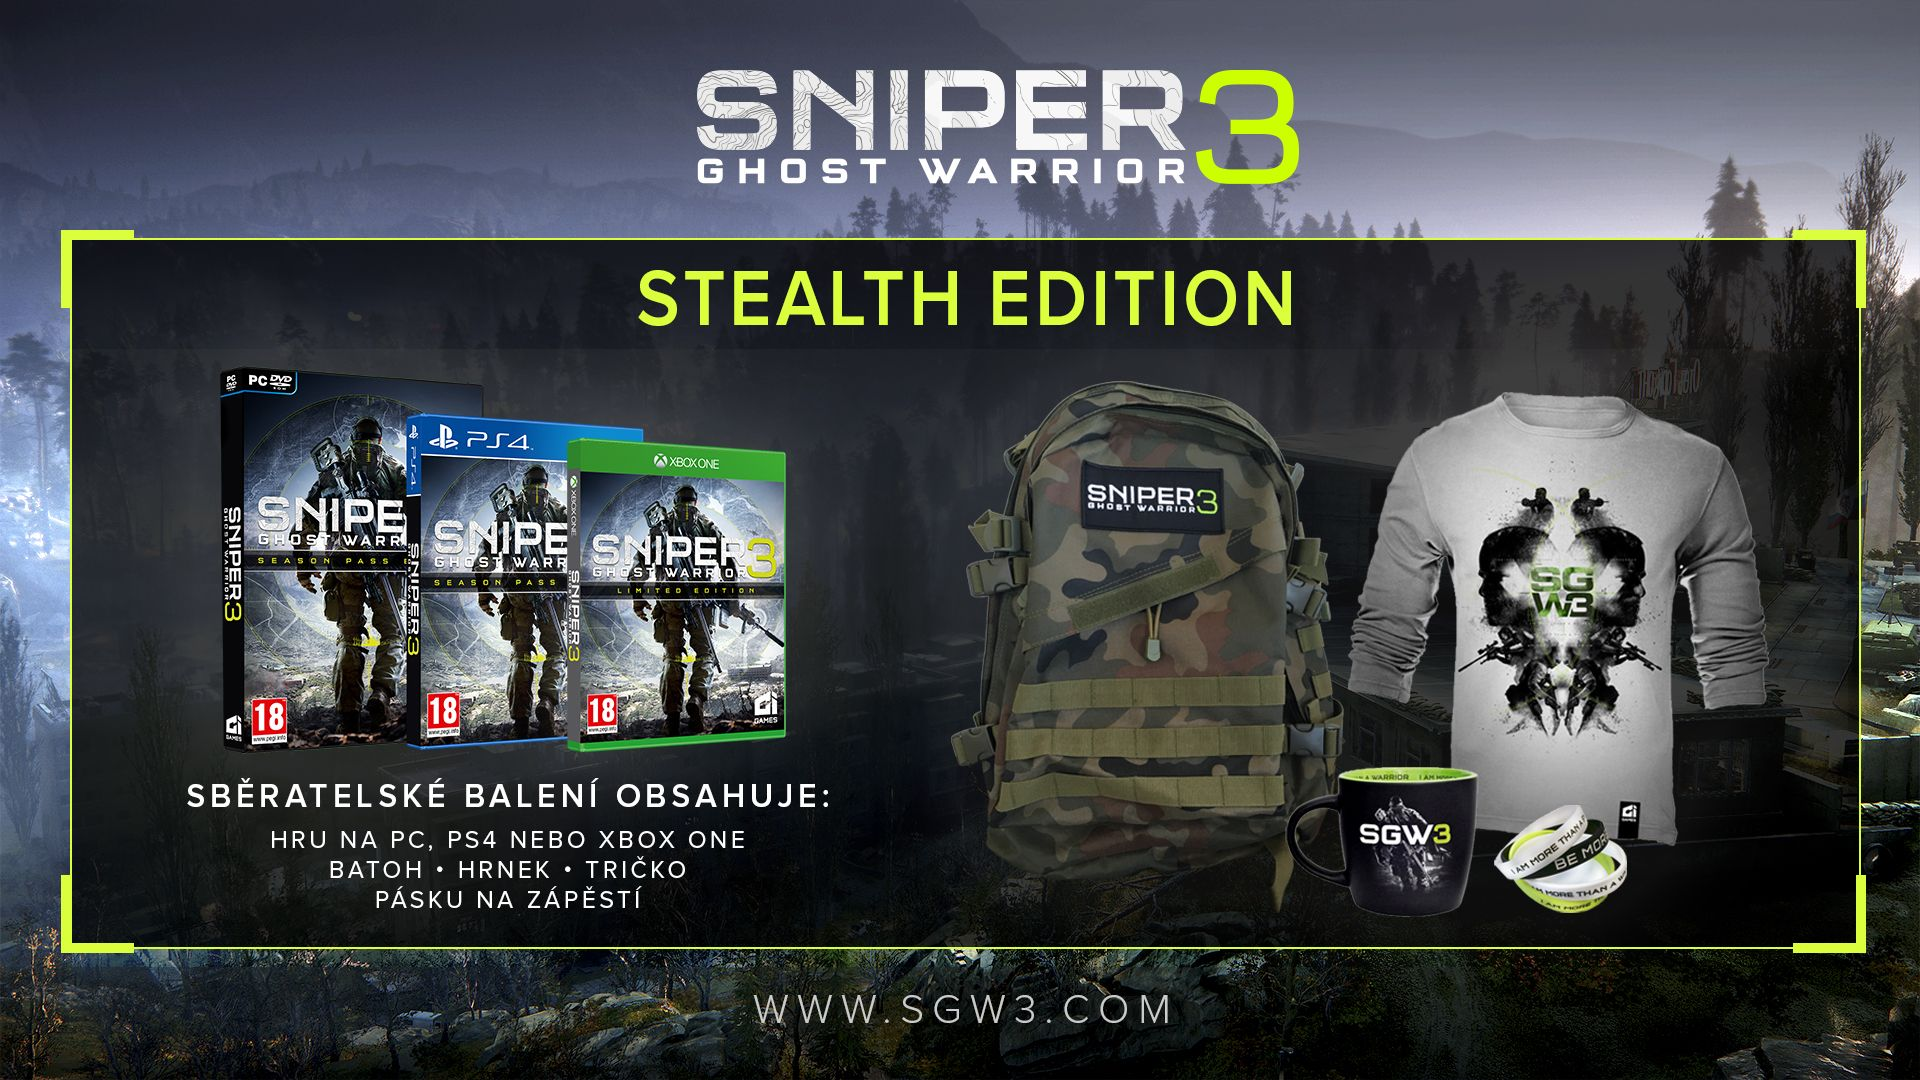 Sniper Ghost Warrior 3 Wallpaper Group 35 Hd Wallpapers 546644